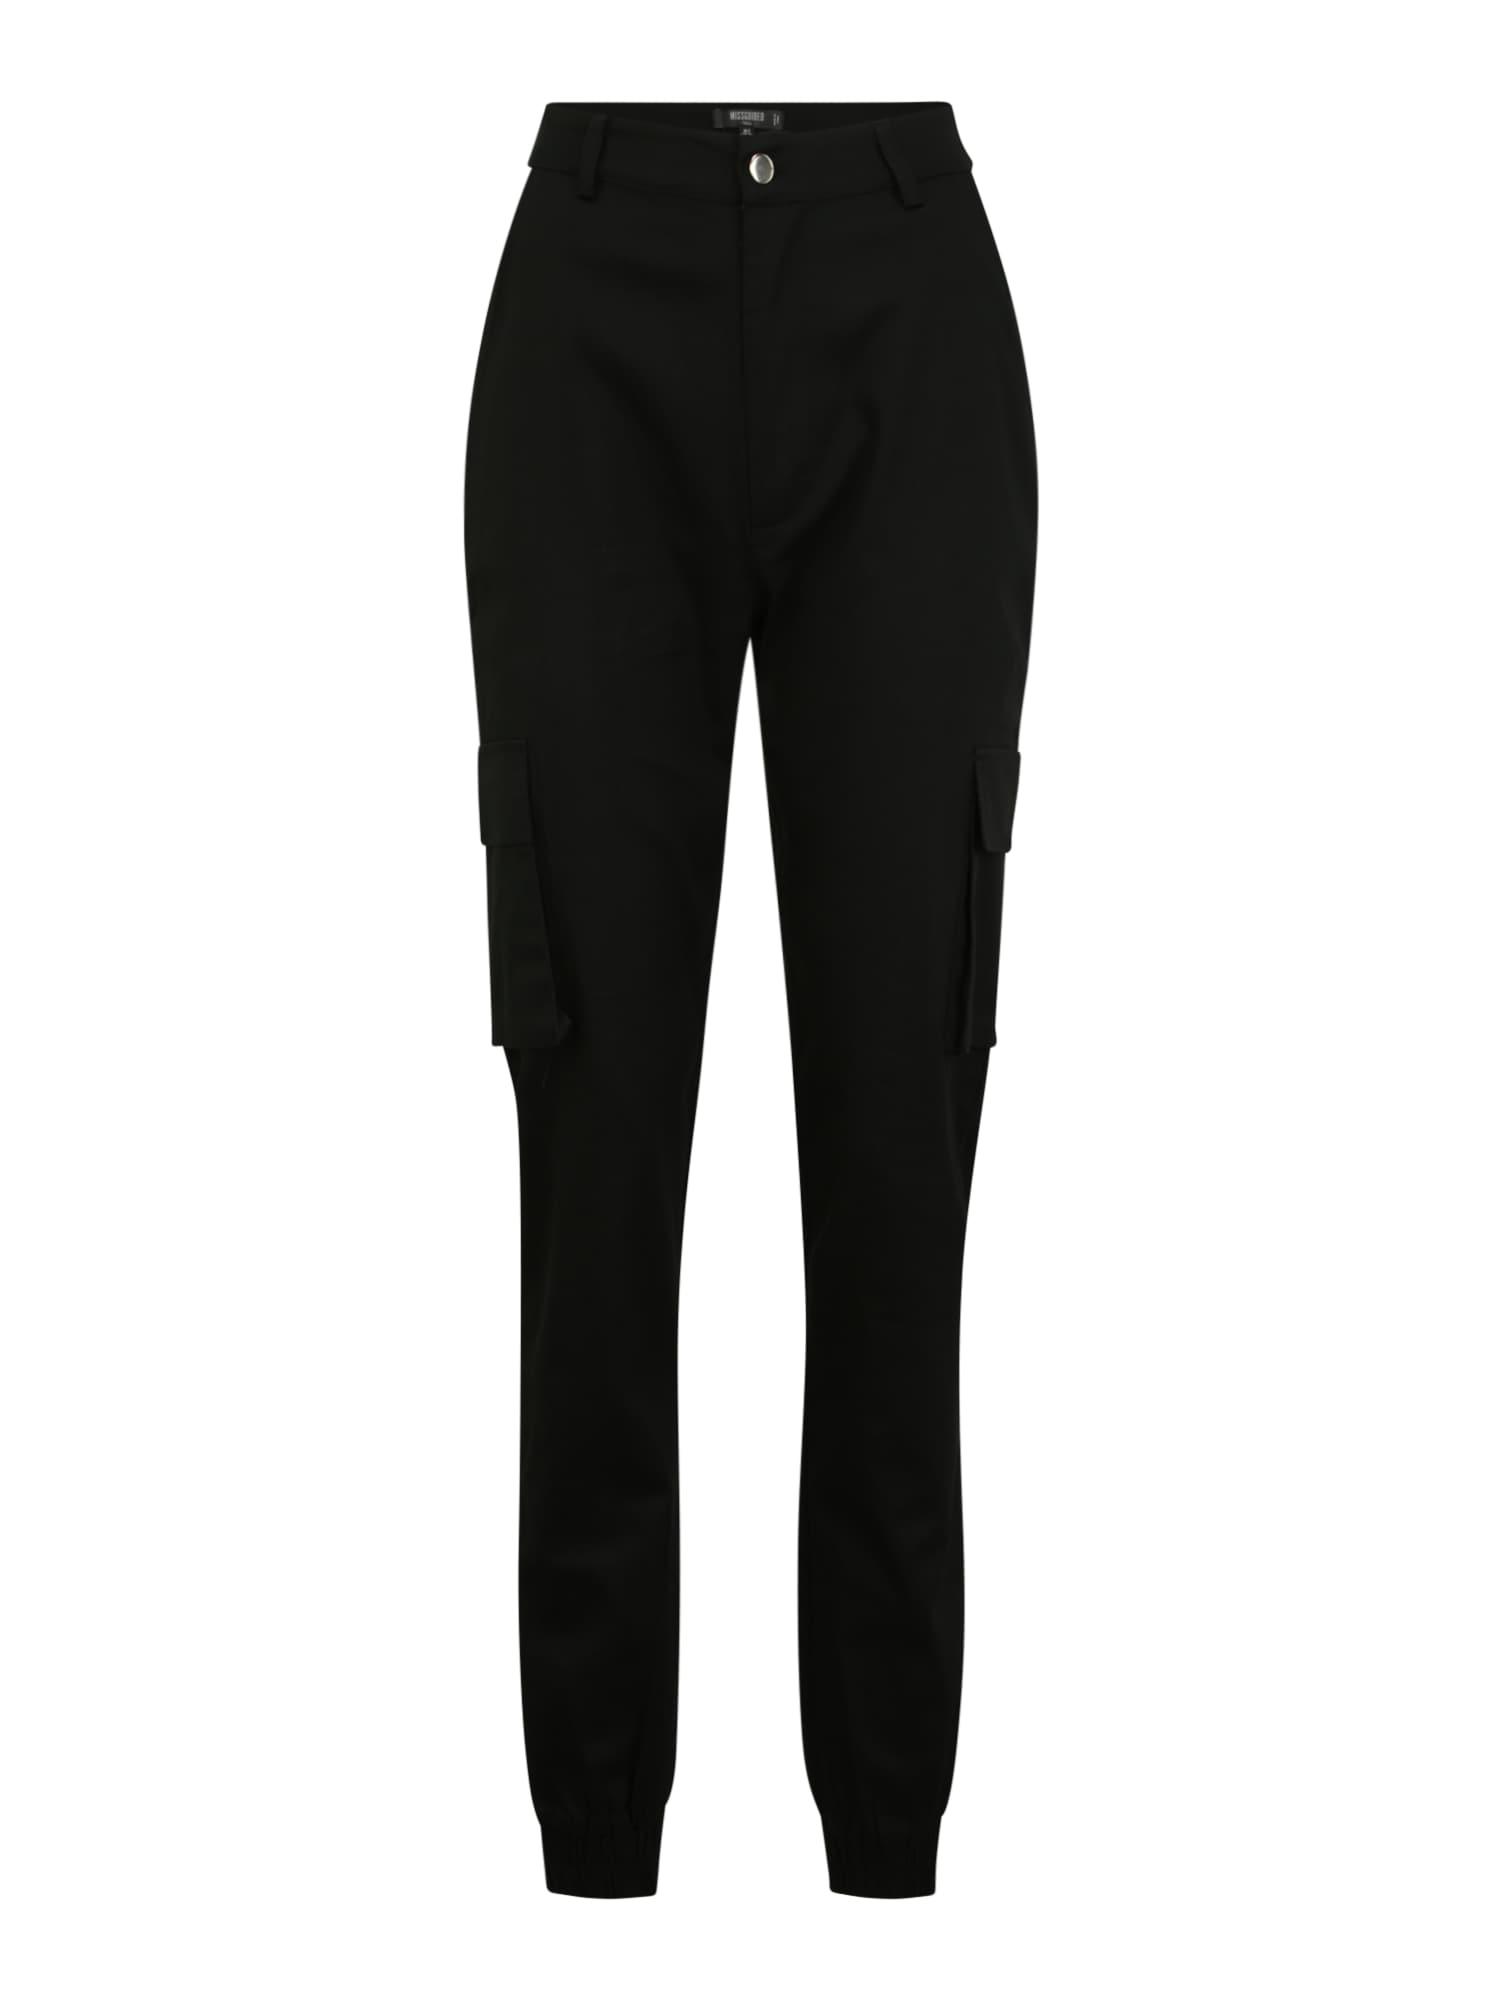 Missguided (Tall) Laisvo stiliaus kelnės